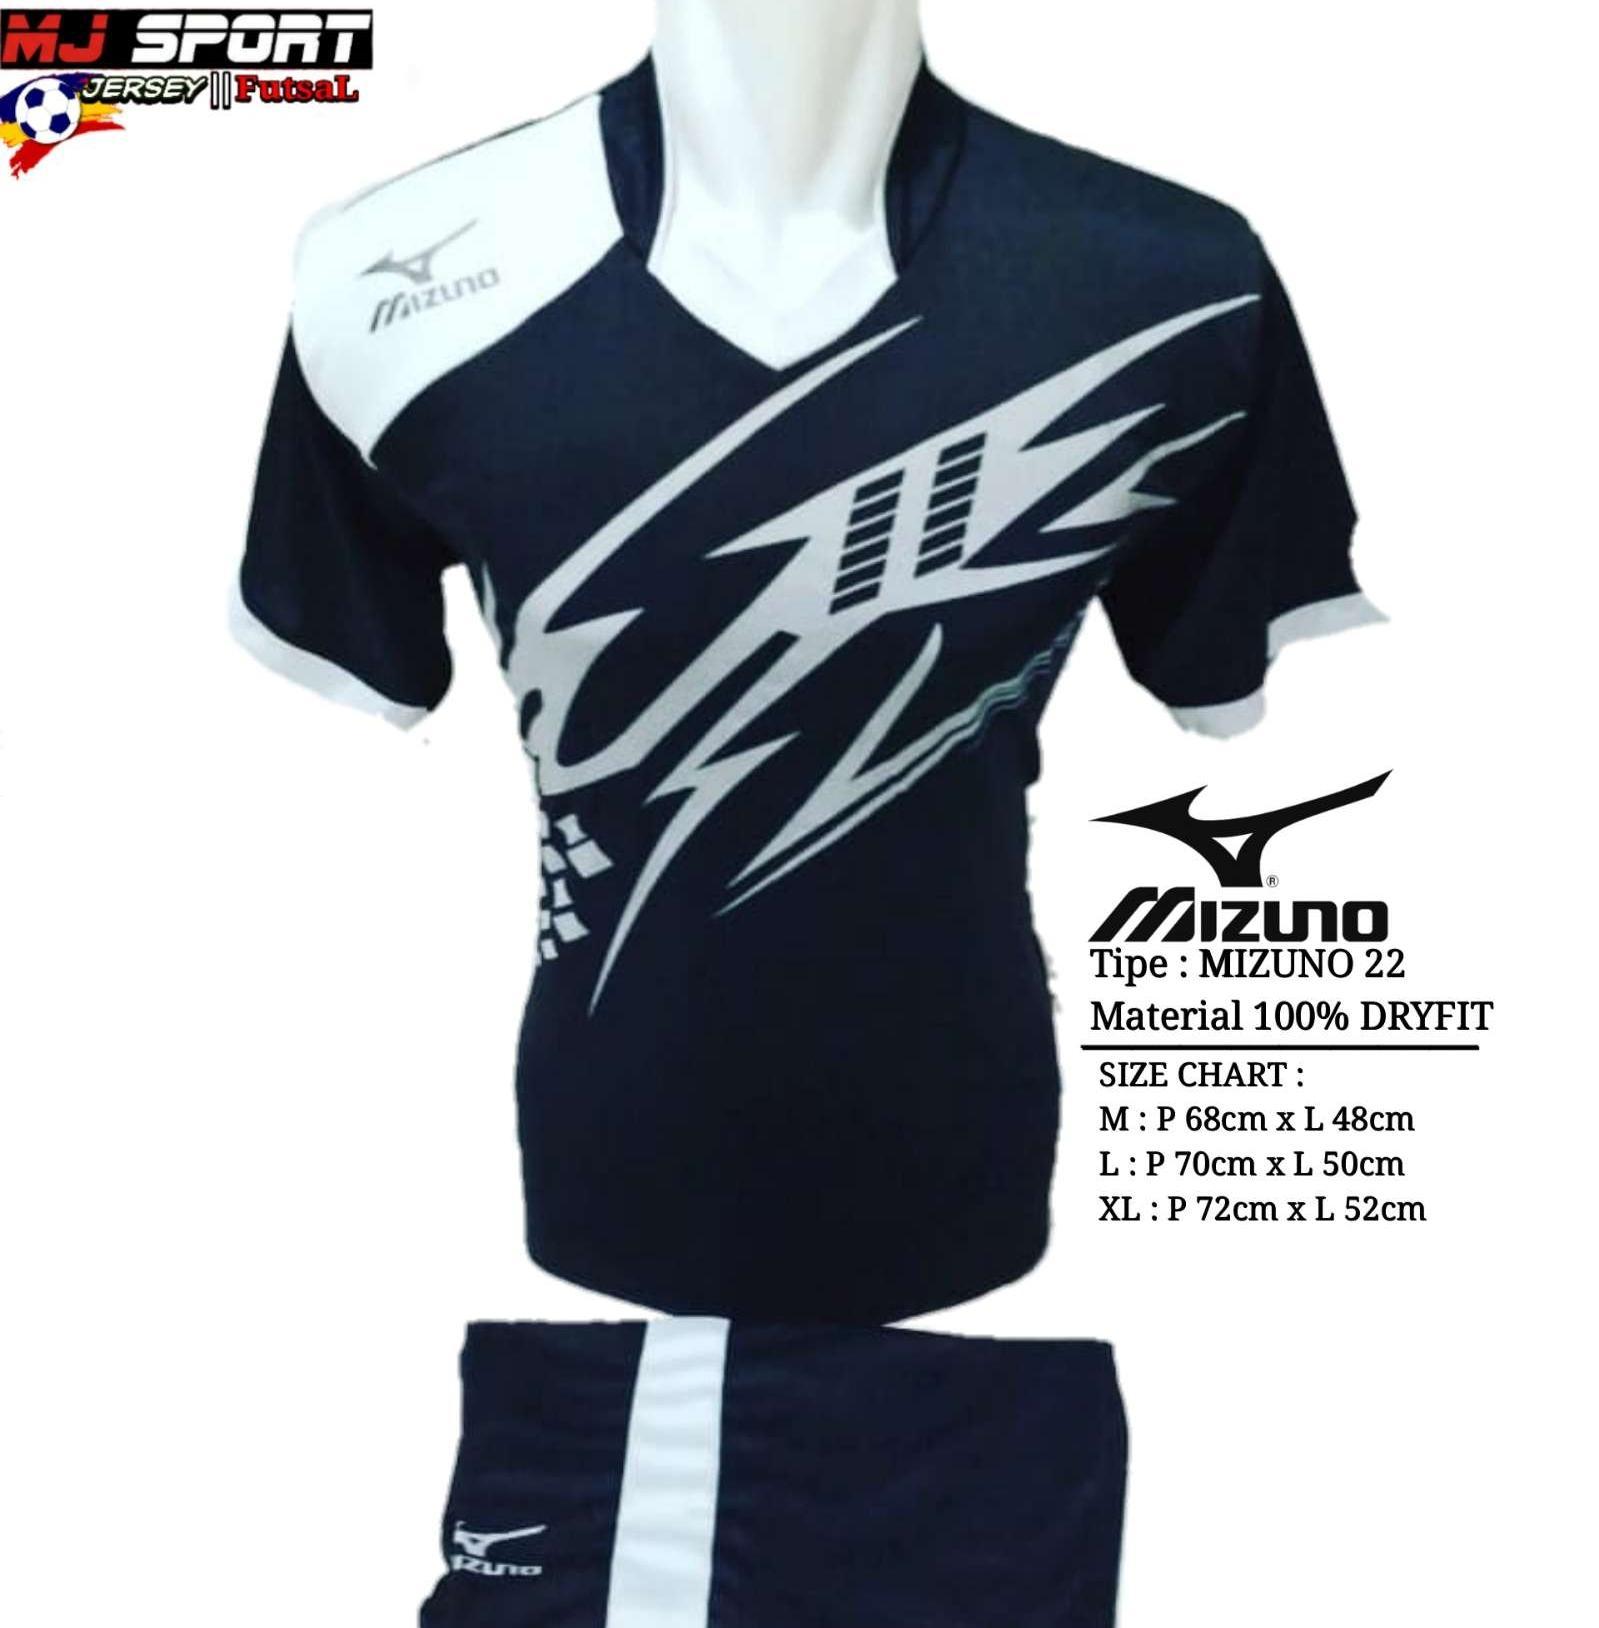 [ BEST SELLER ] Baju Olahraga Jersey Bola Setelan Futsal / Volly Badminton Mizuno